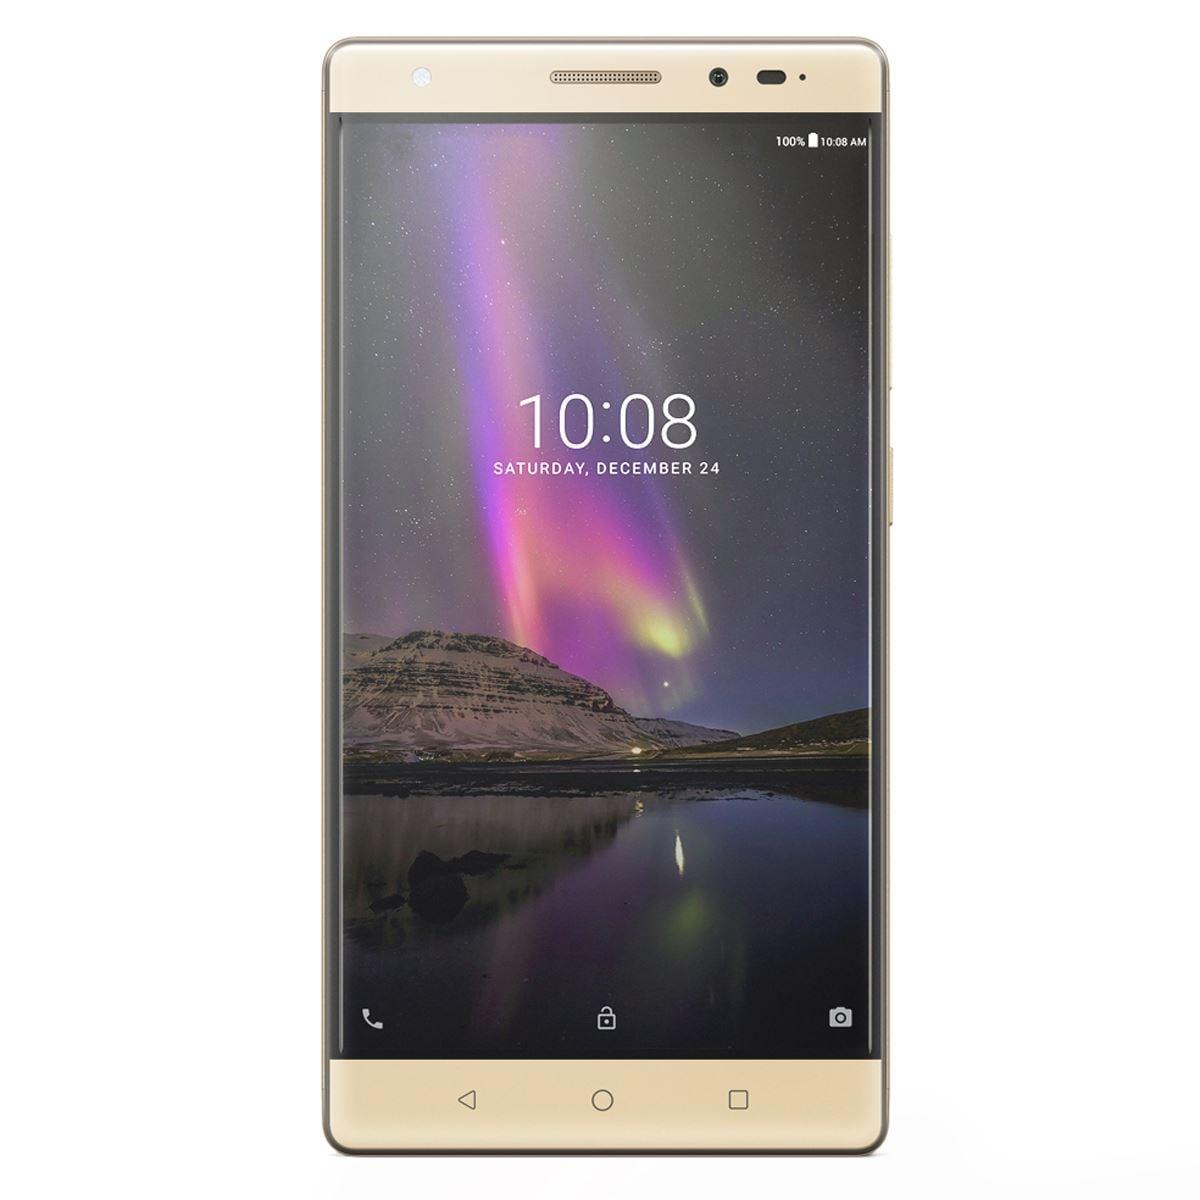 Tablet PhabPB2-670Y Lenovo 32GB Gold